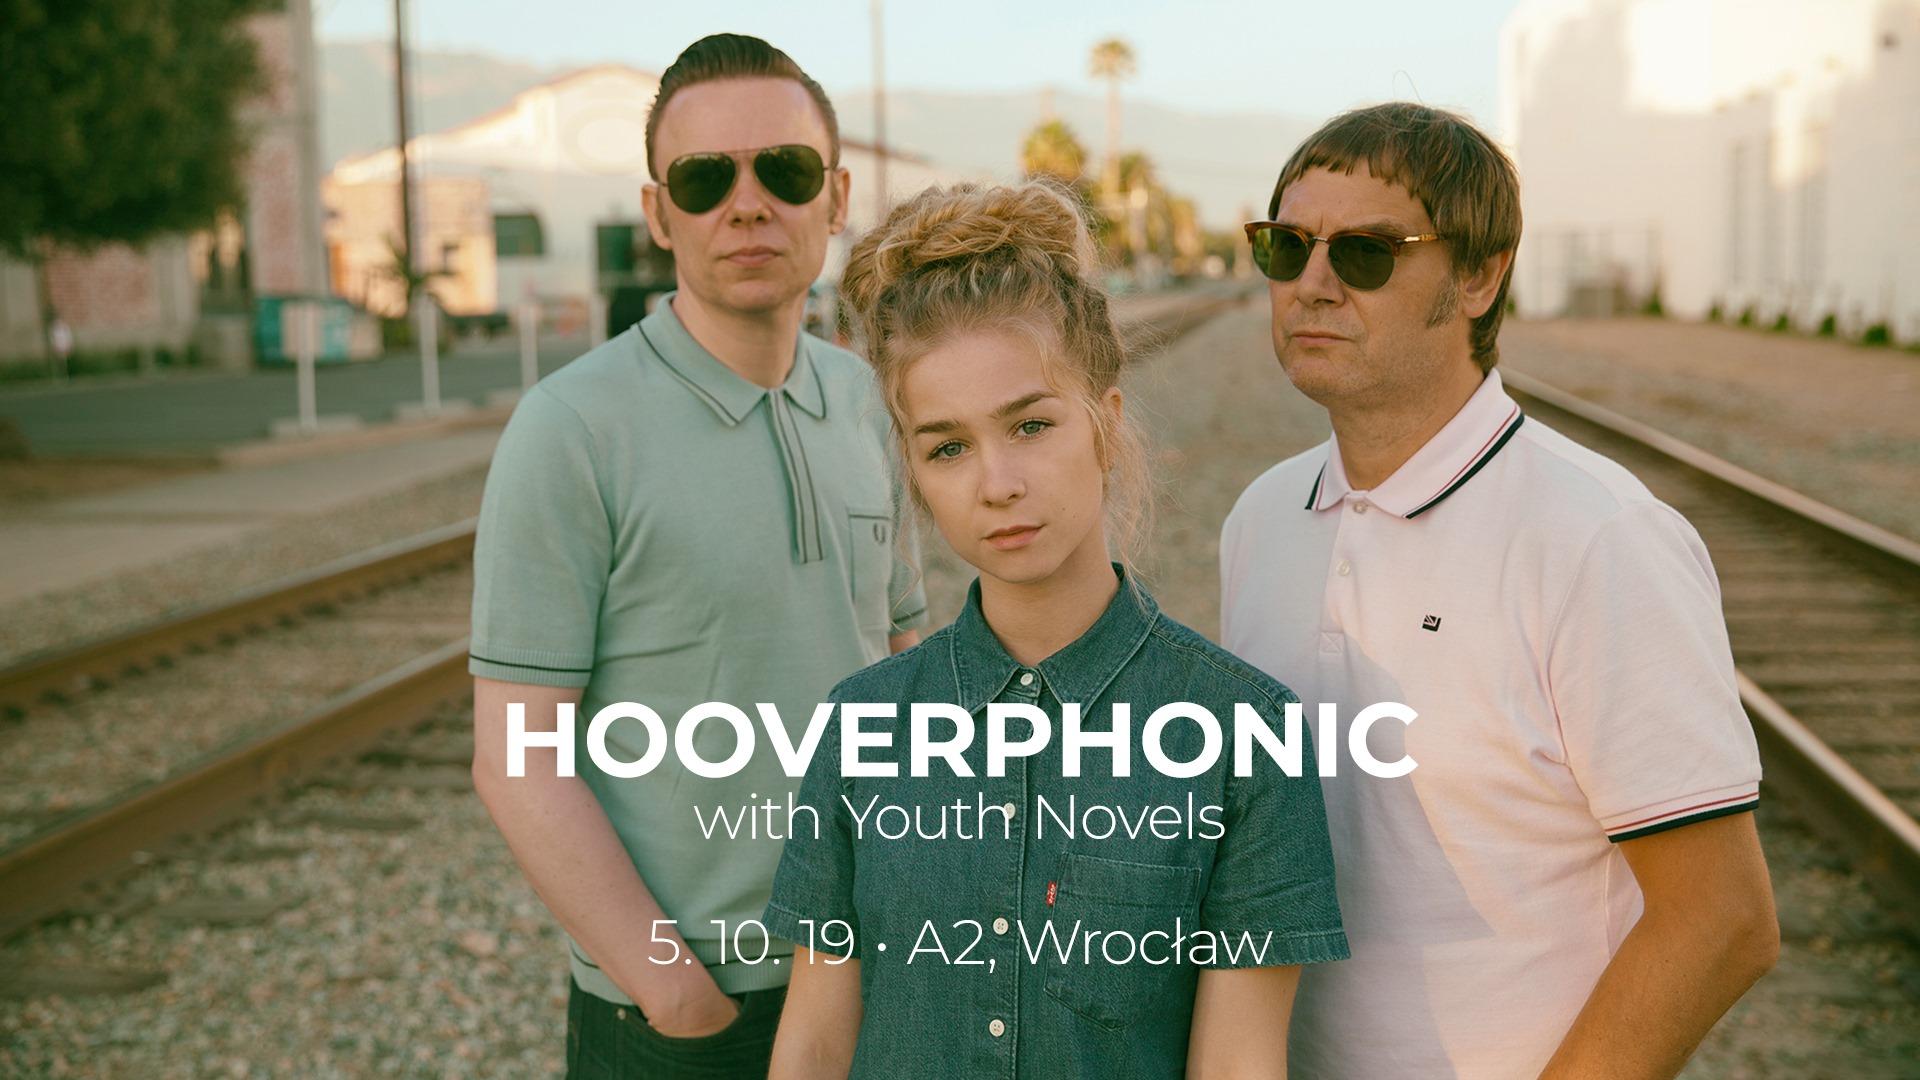 Hooverphonic 5.10 | A2, Wrocław